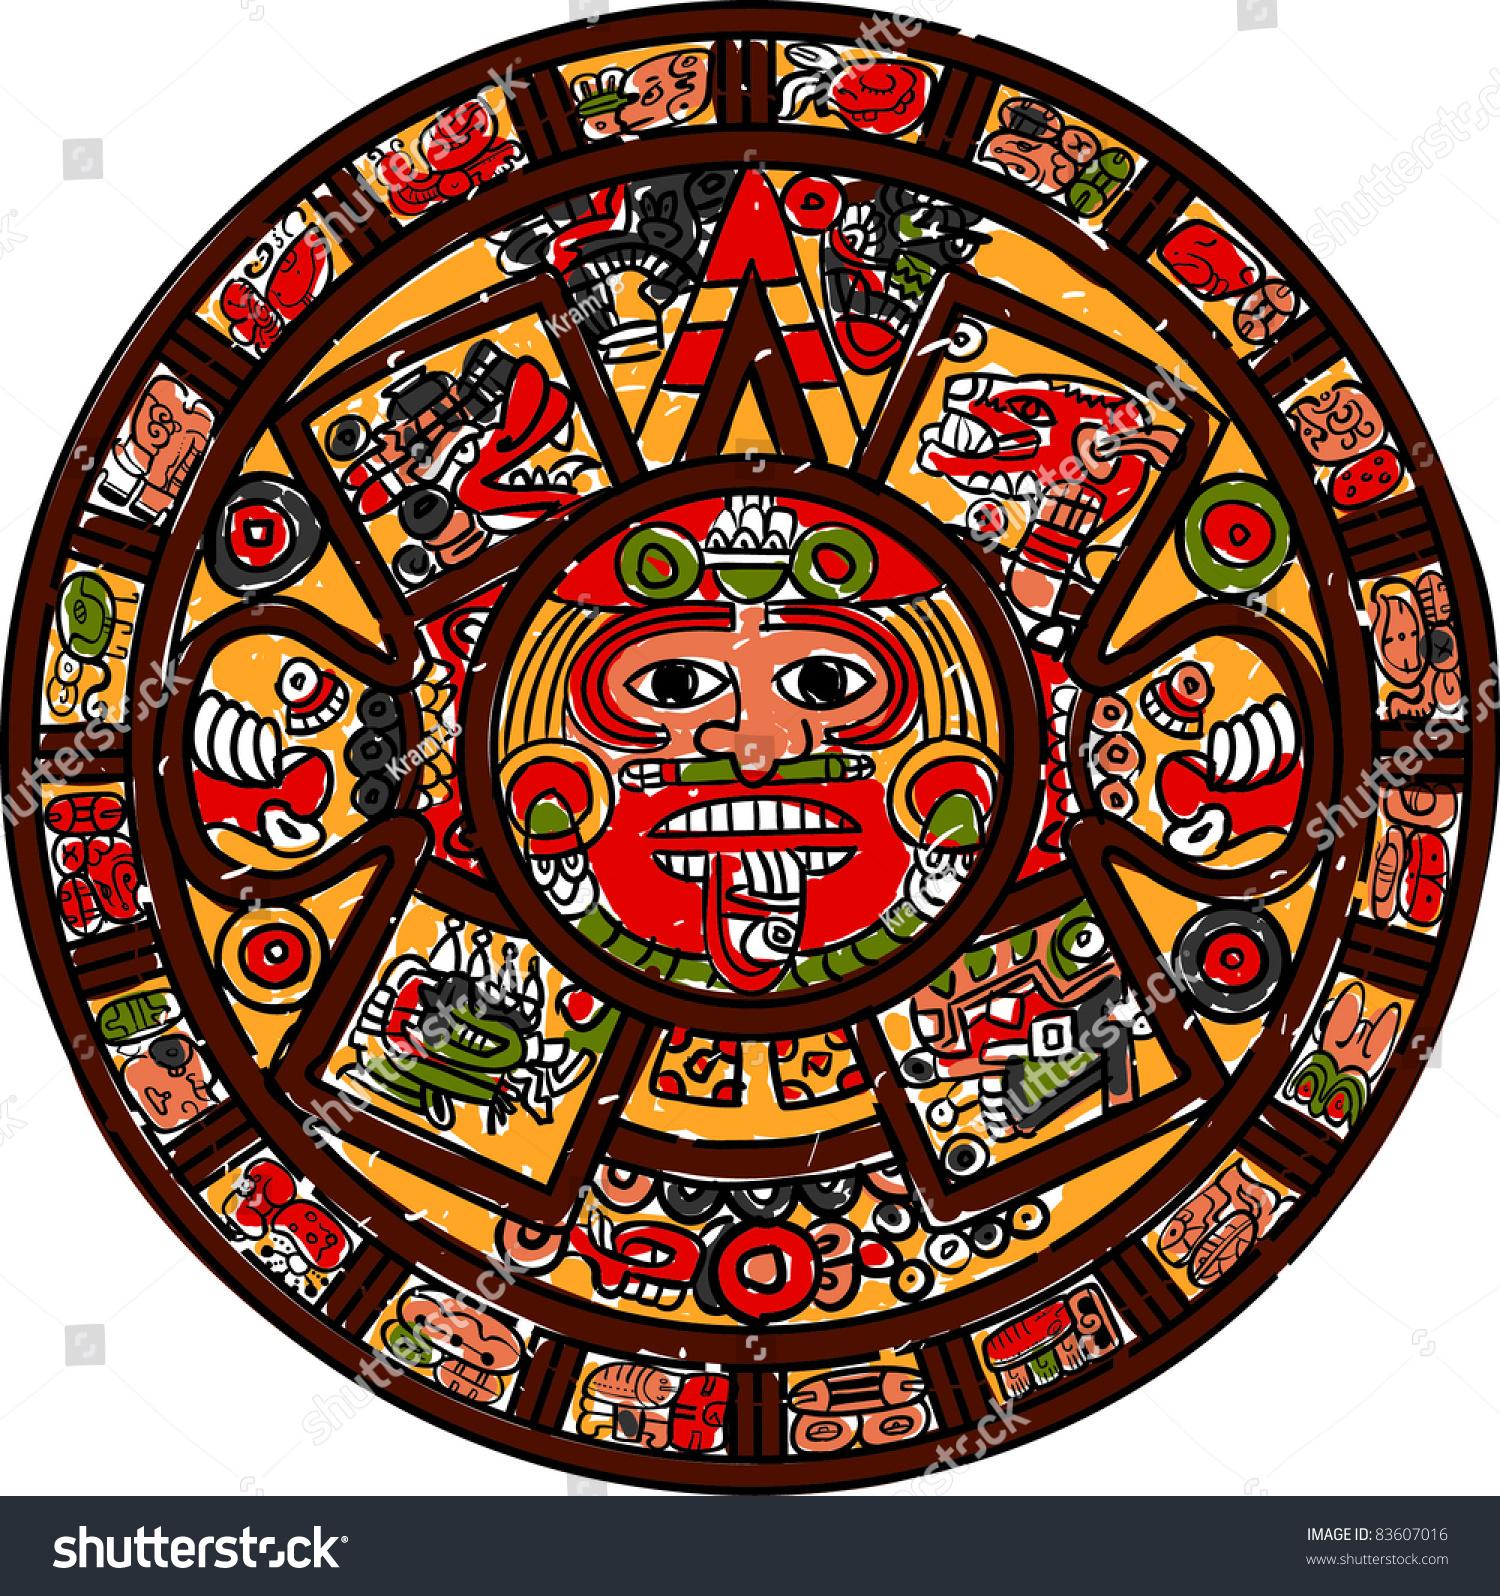 Mayan Calendar Stock Vector Illustration 83607016 : Shutterstock